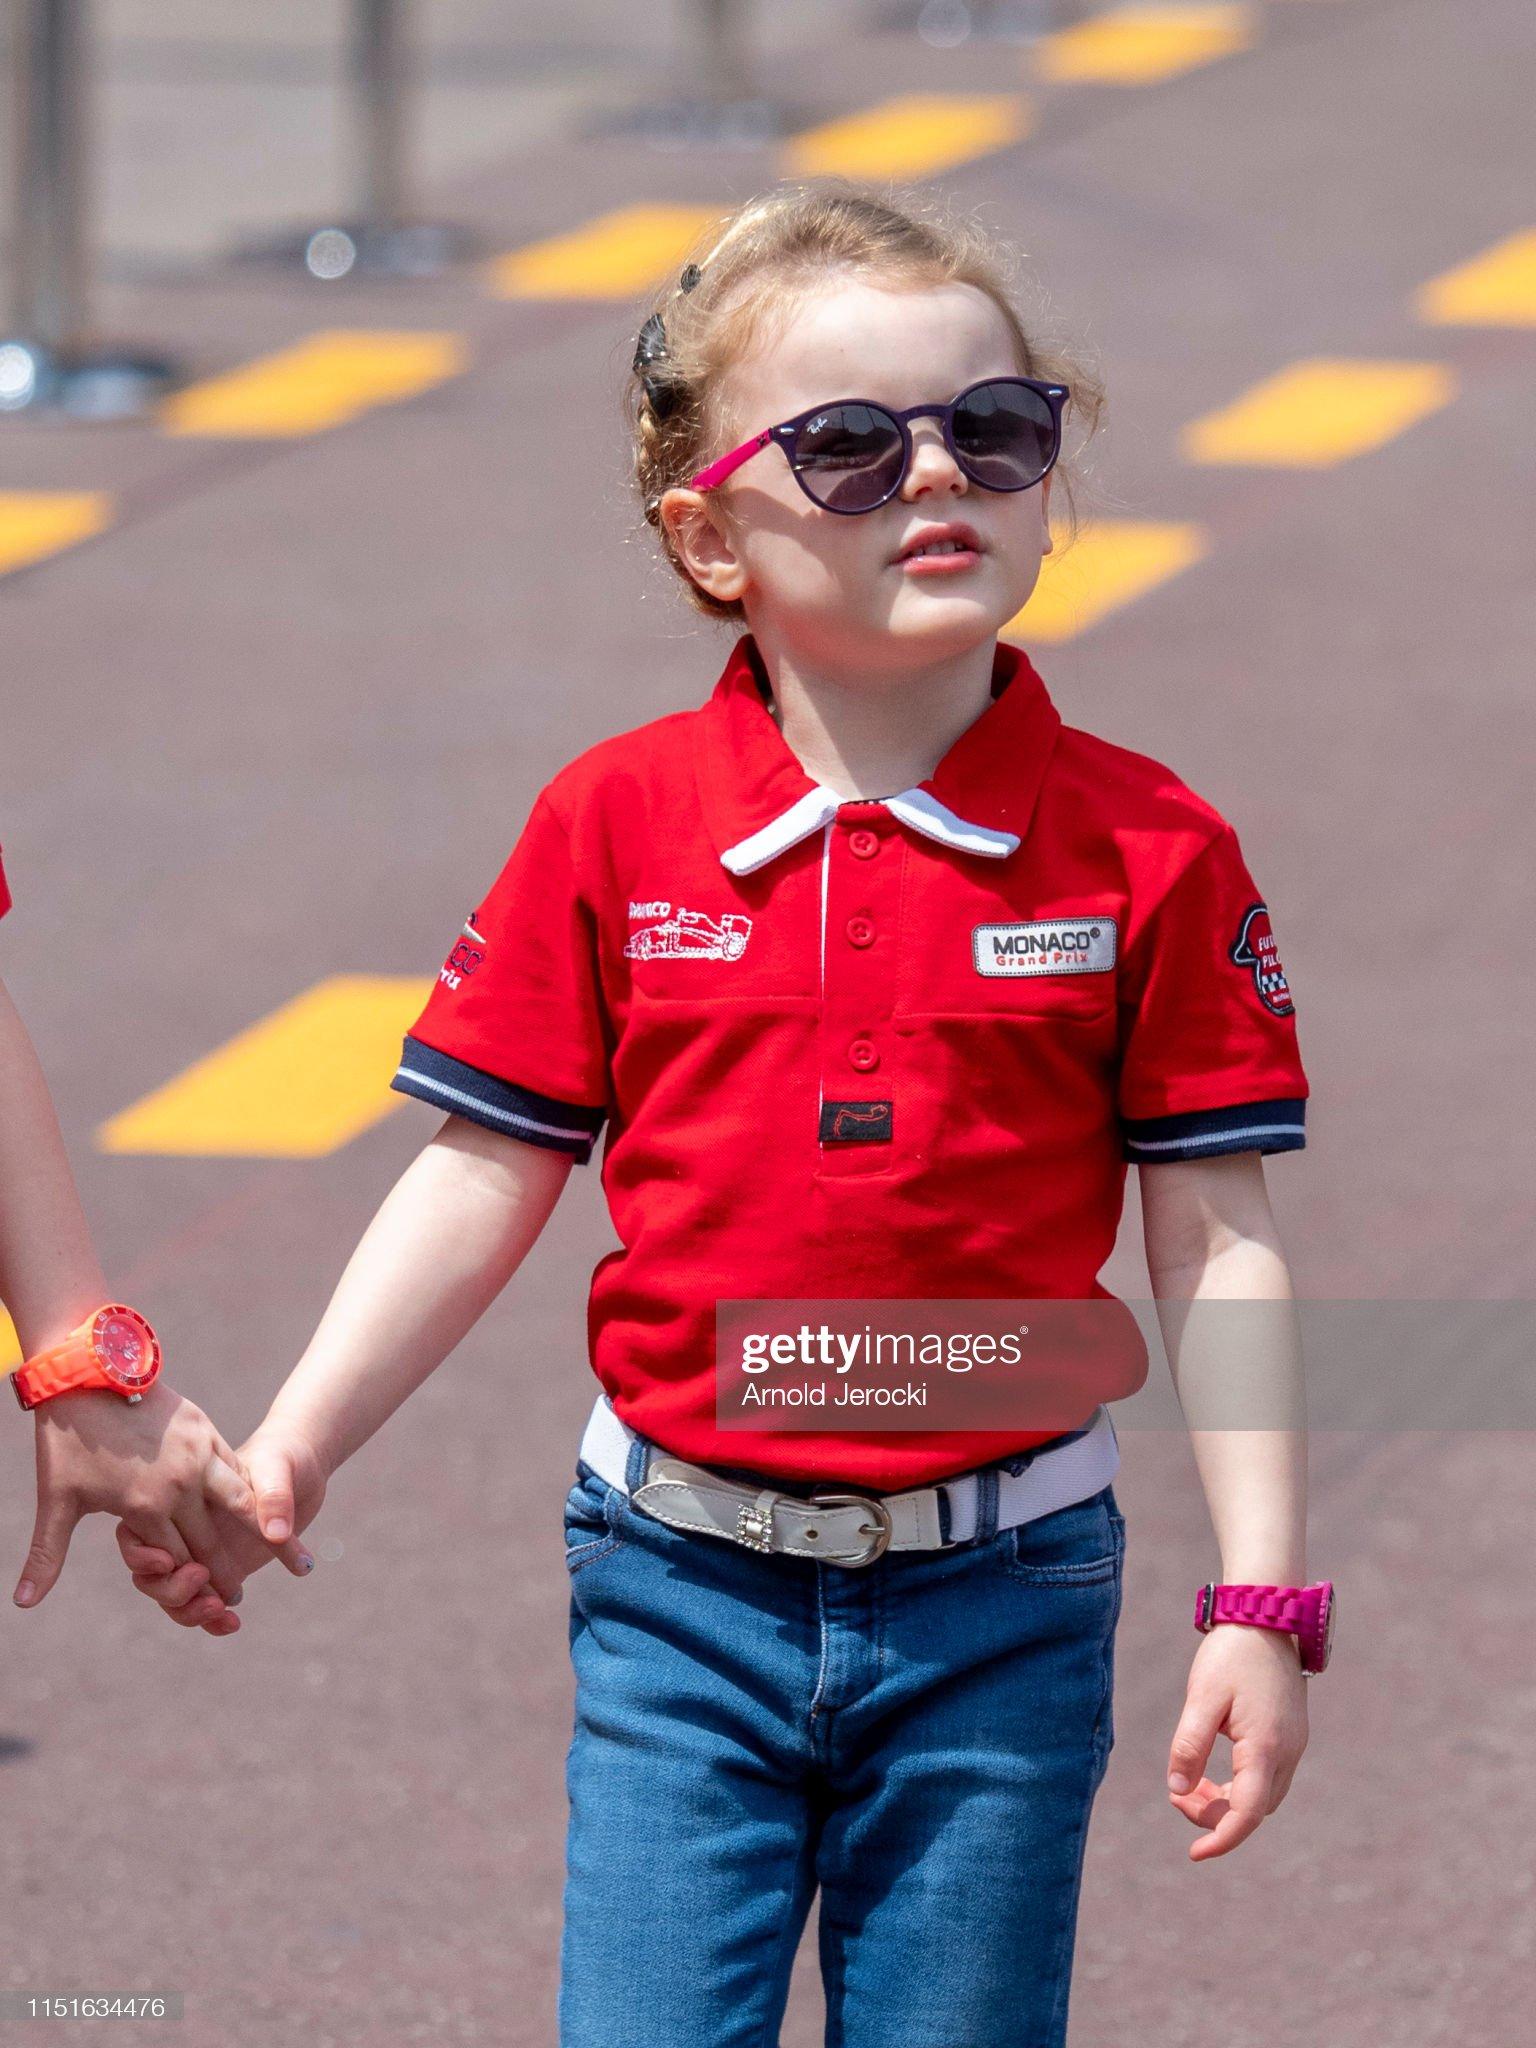 princess-gabriella-attends-the-f1-grand-prix-of-monaco-qualifying-on-picture-id1151634476